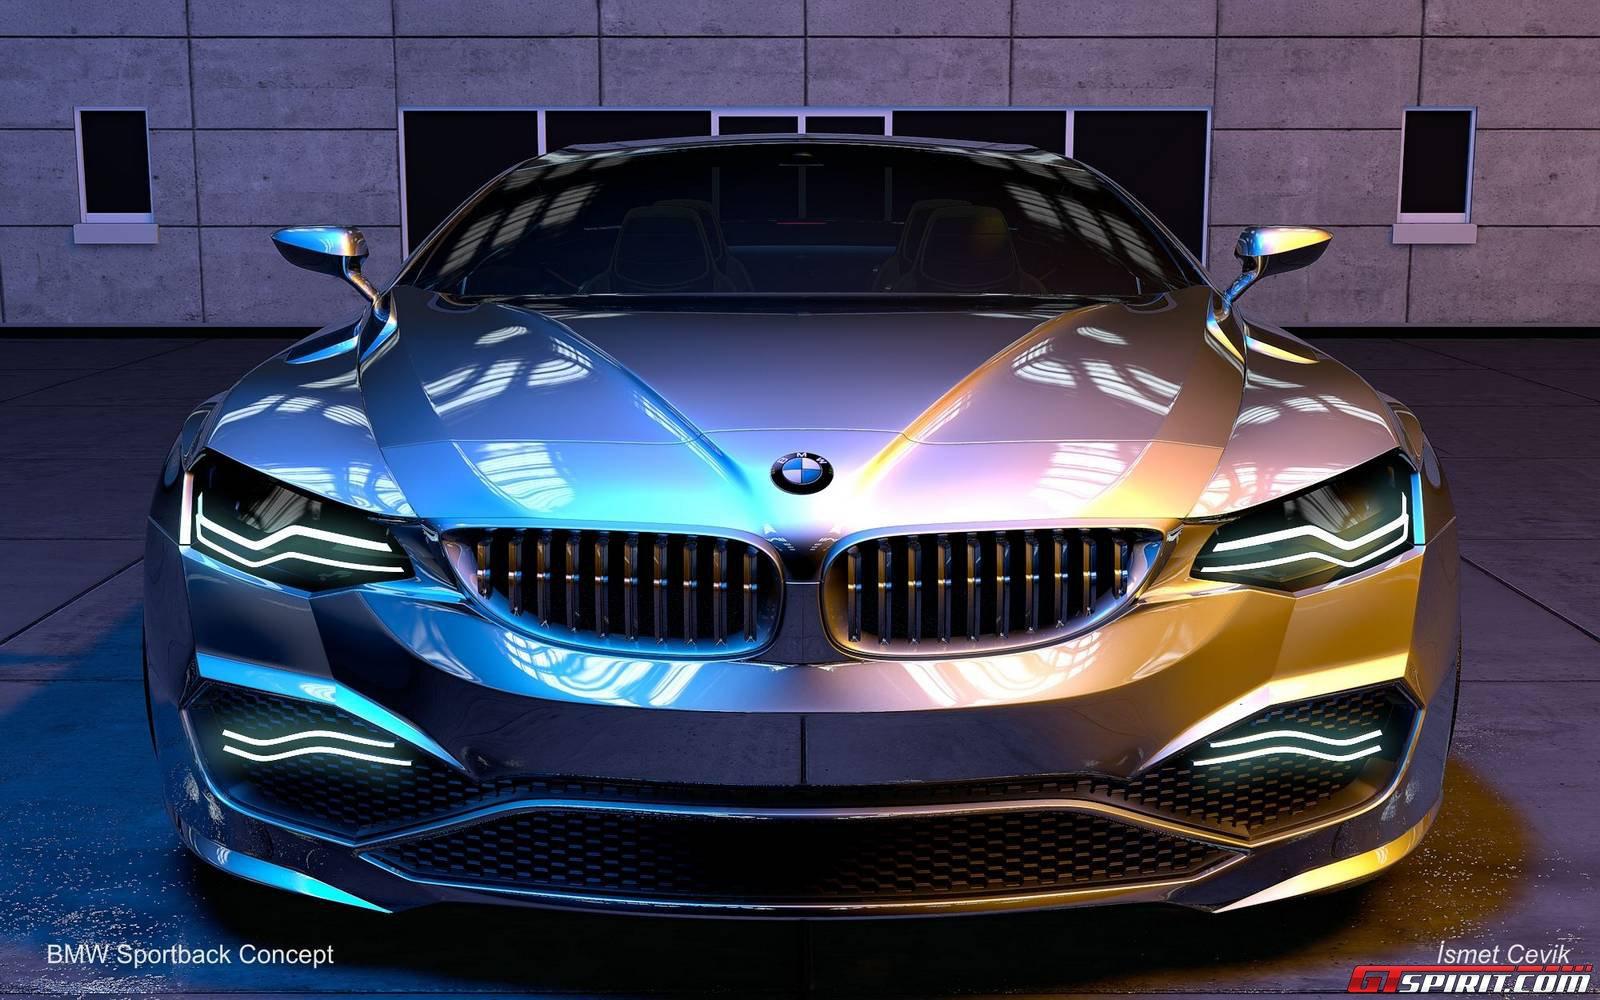 2021 BMW M9 Spesification